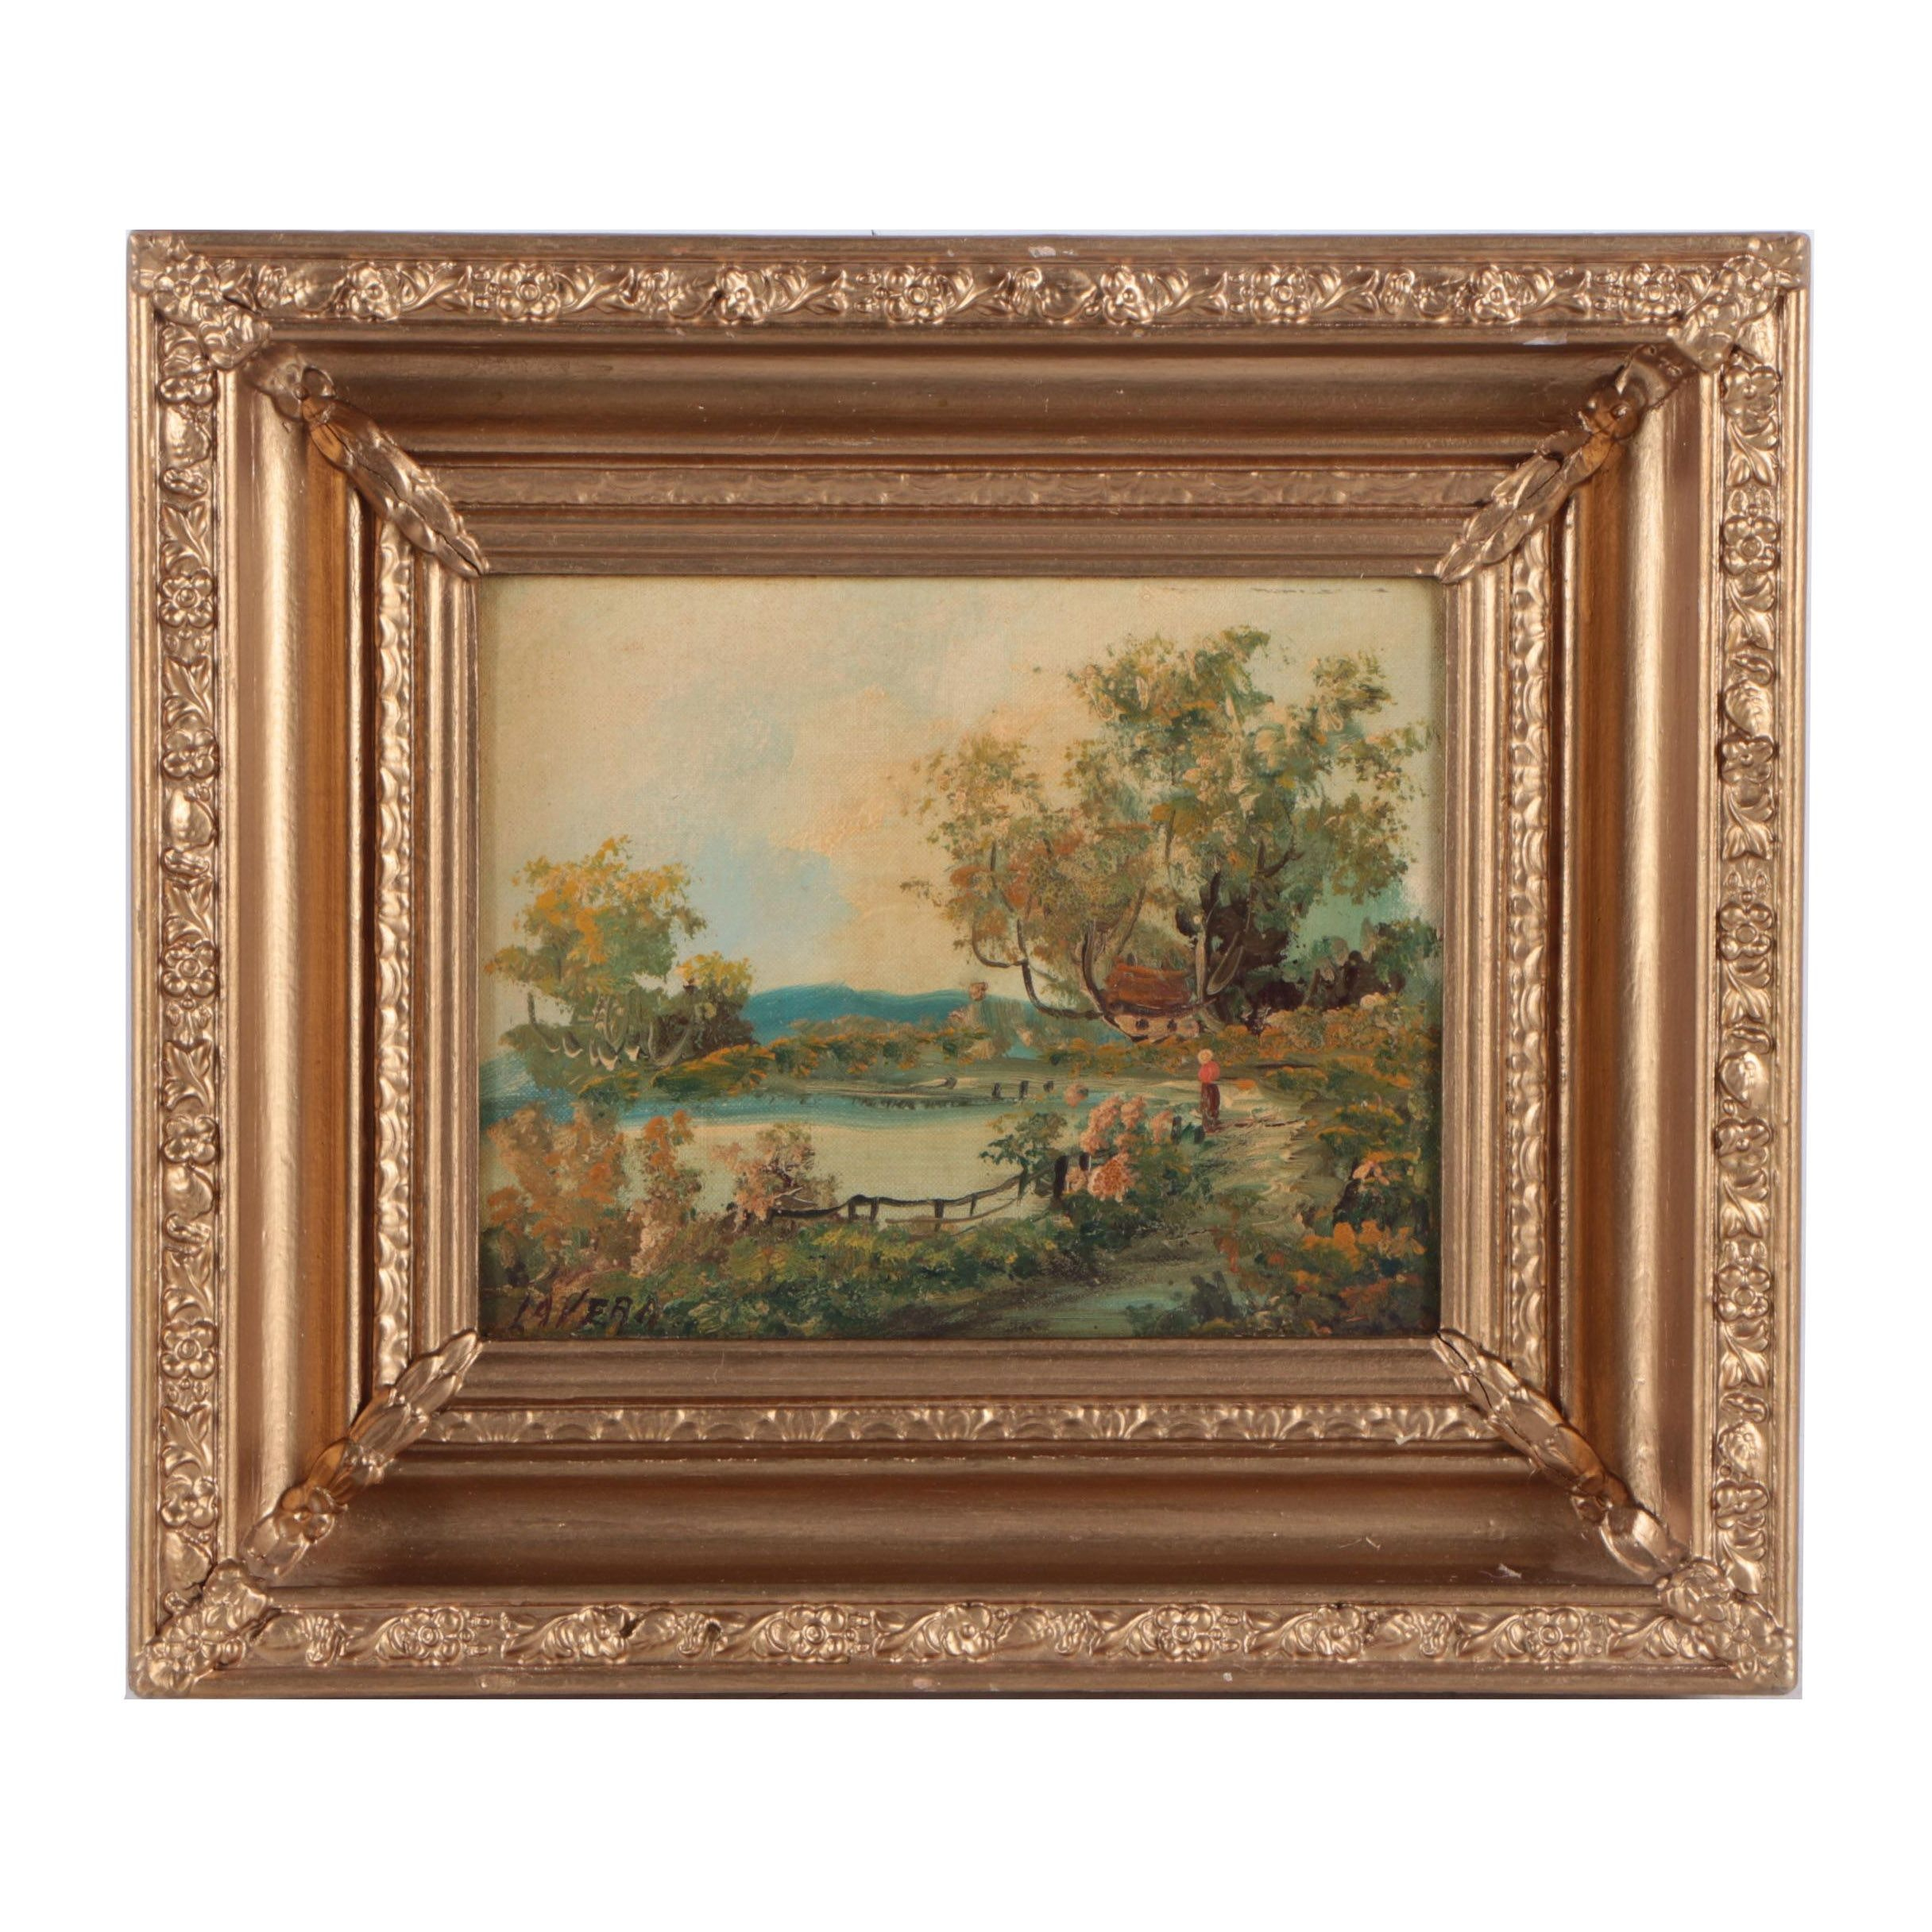 LaVera Oil Painting on Canvas Board Landscape